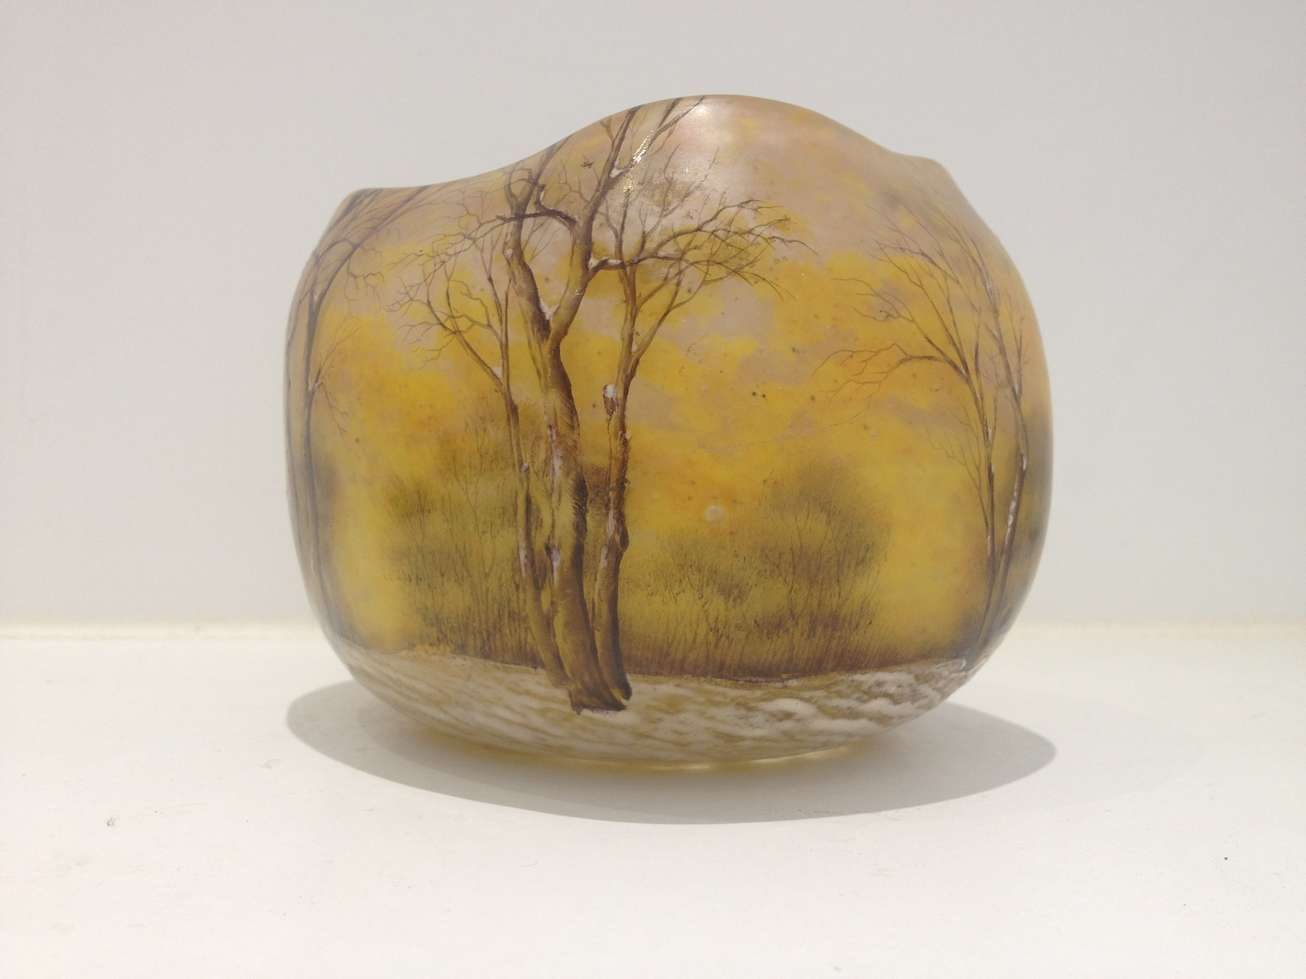 daum-freres-patrimoine-vase-decoratif-resine-transparence-art-restauration-reparation-restaurarte.jpg